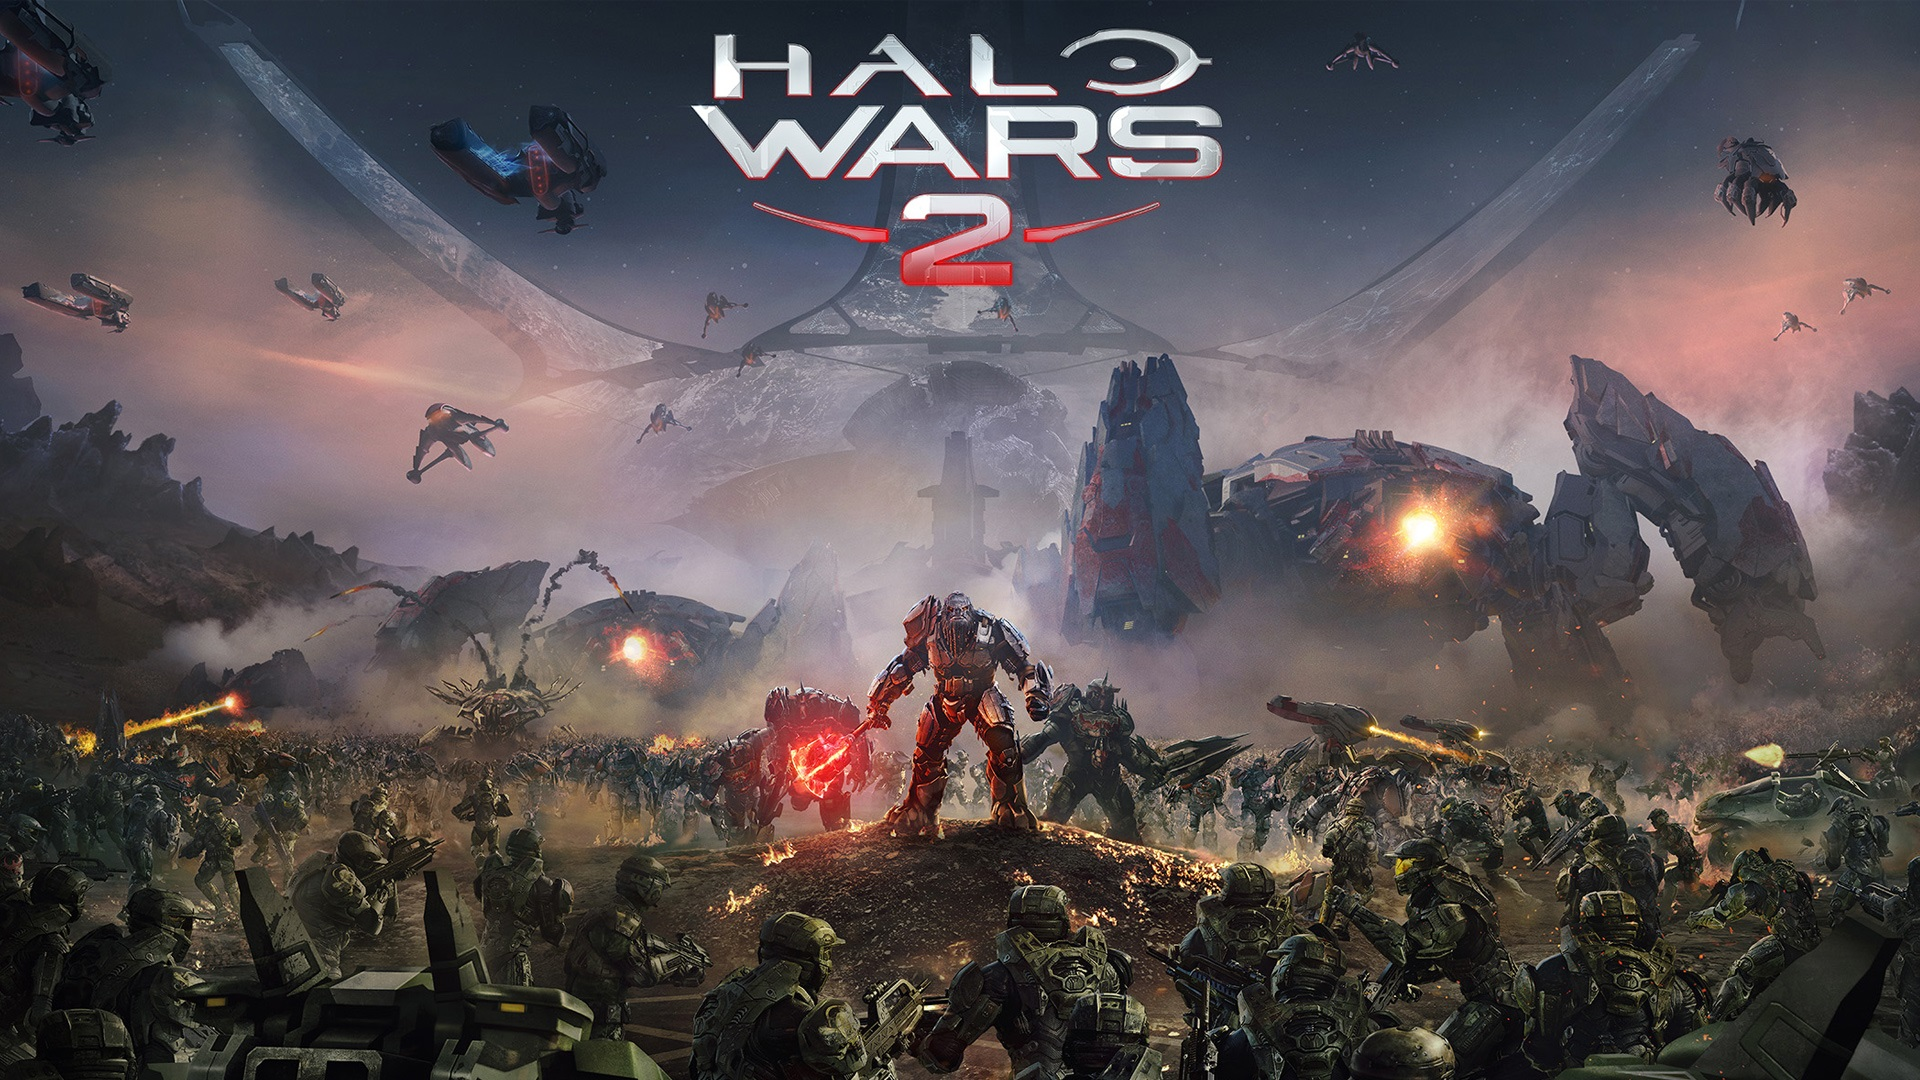 Fonds Décran Jeux Halo Wars 2 Xbox 1920x1080 Full Hd 2k Image